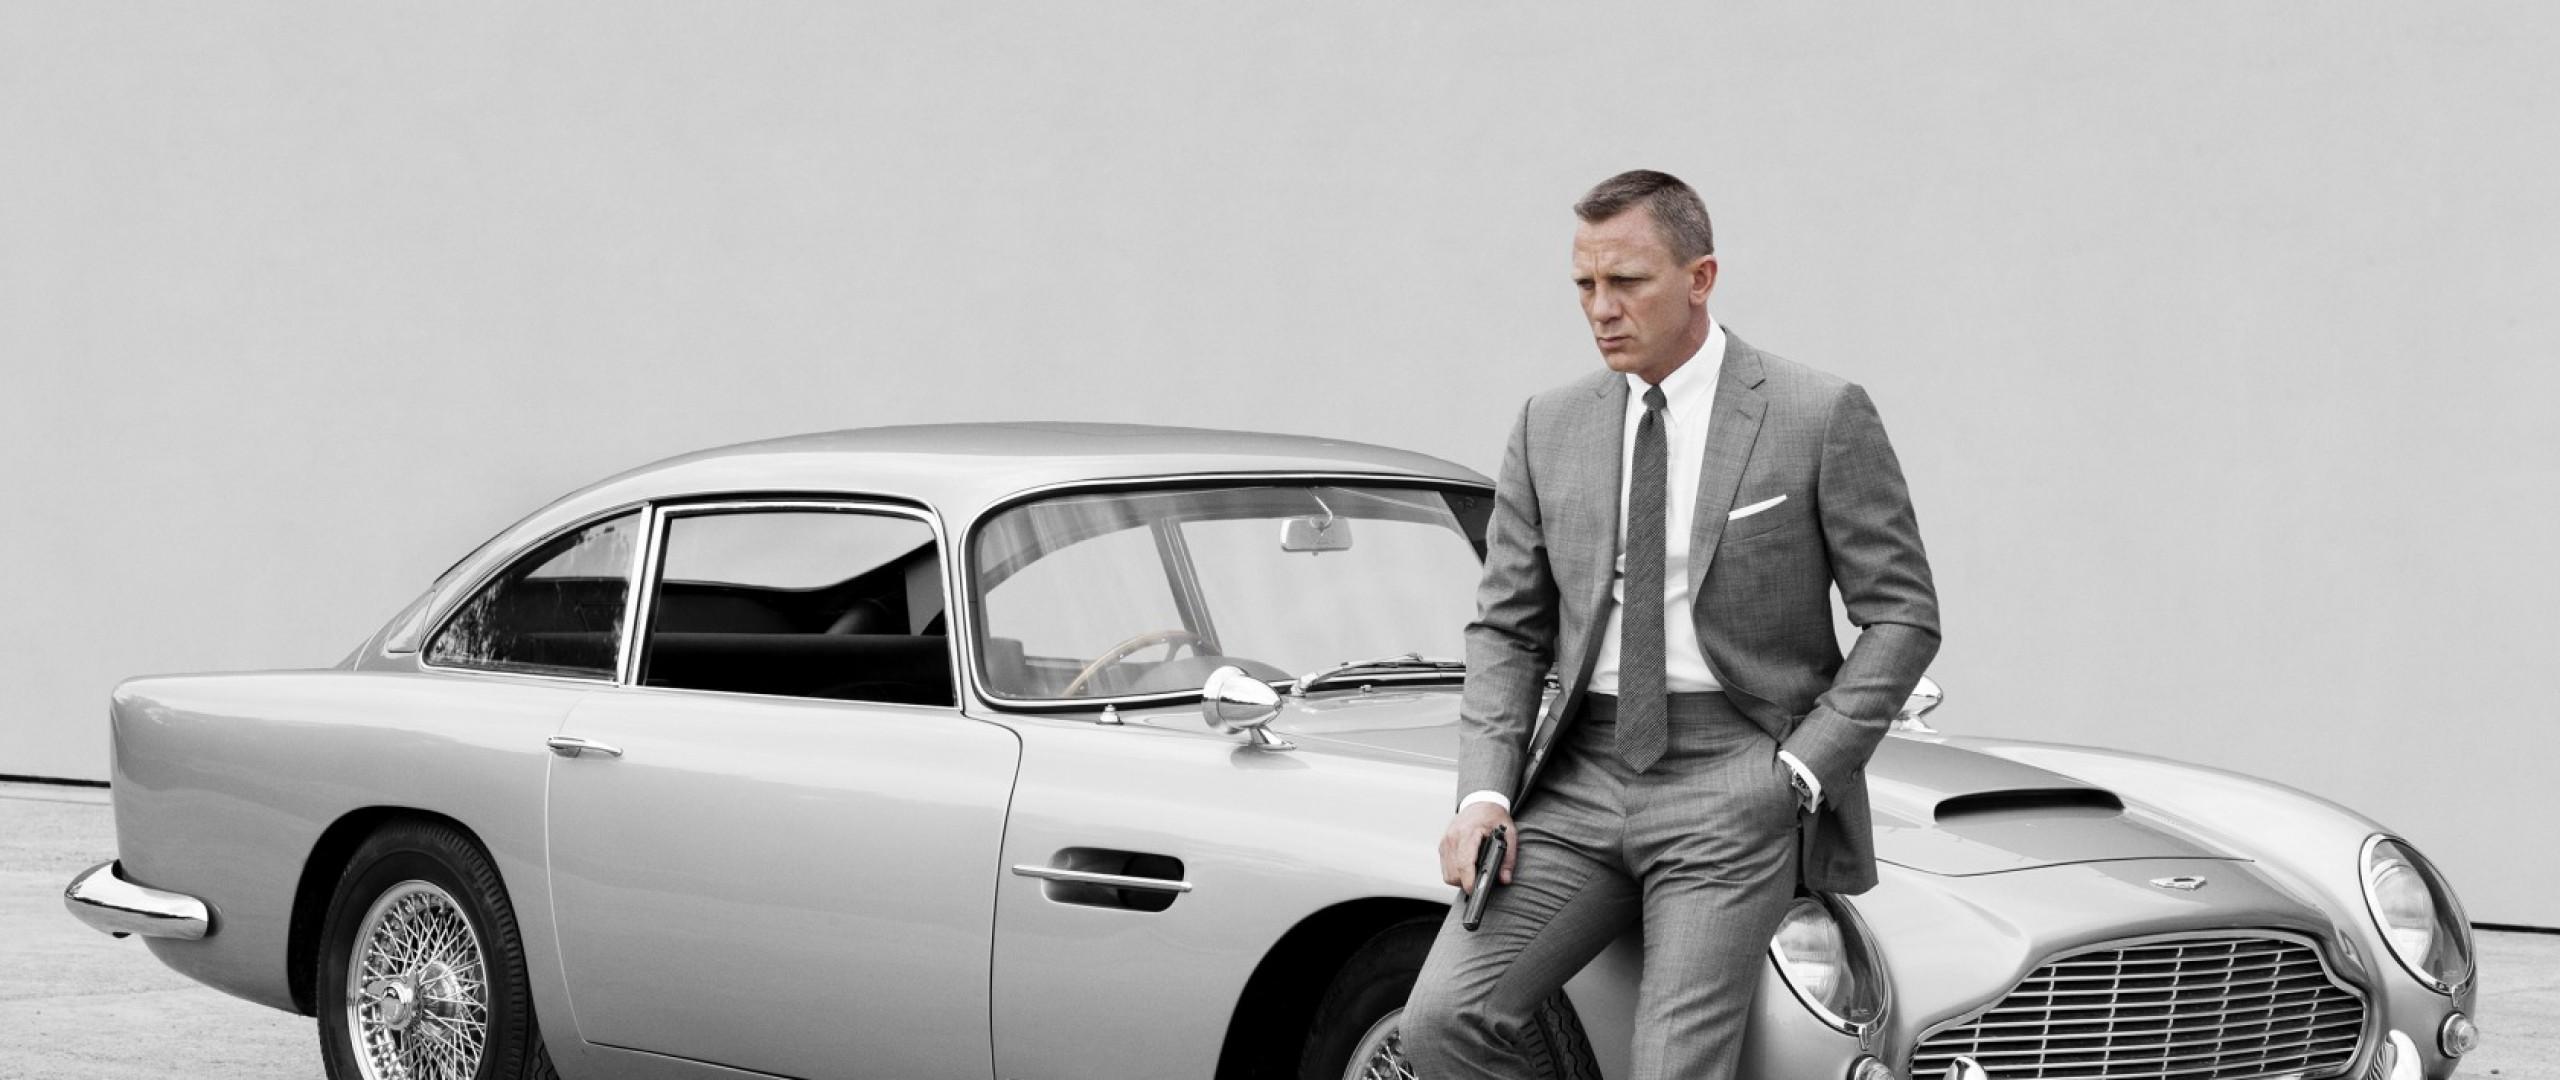 James Bond iPhone Wallpaper (72+ images)